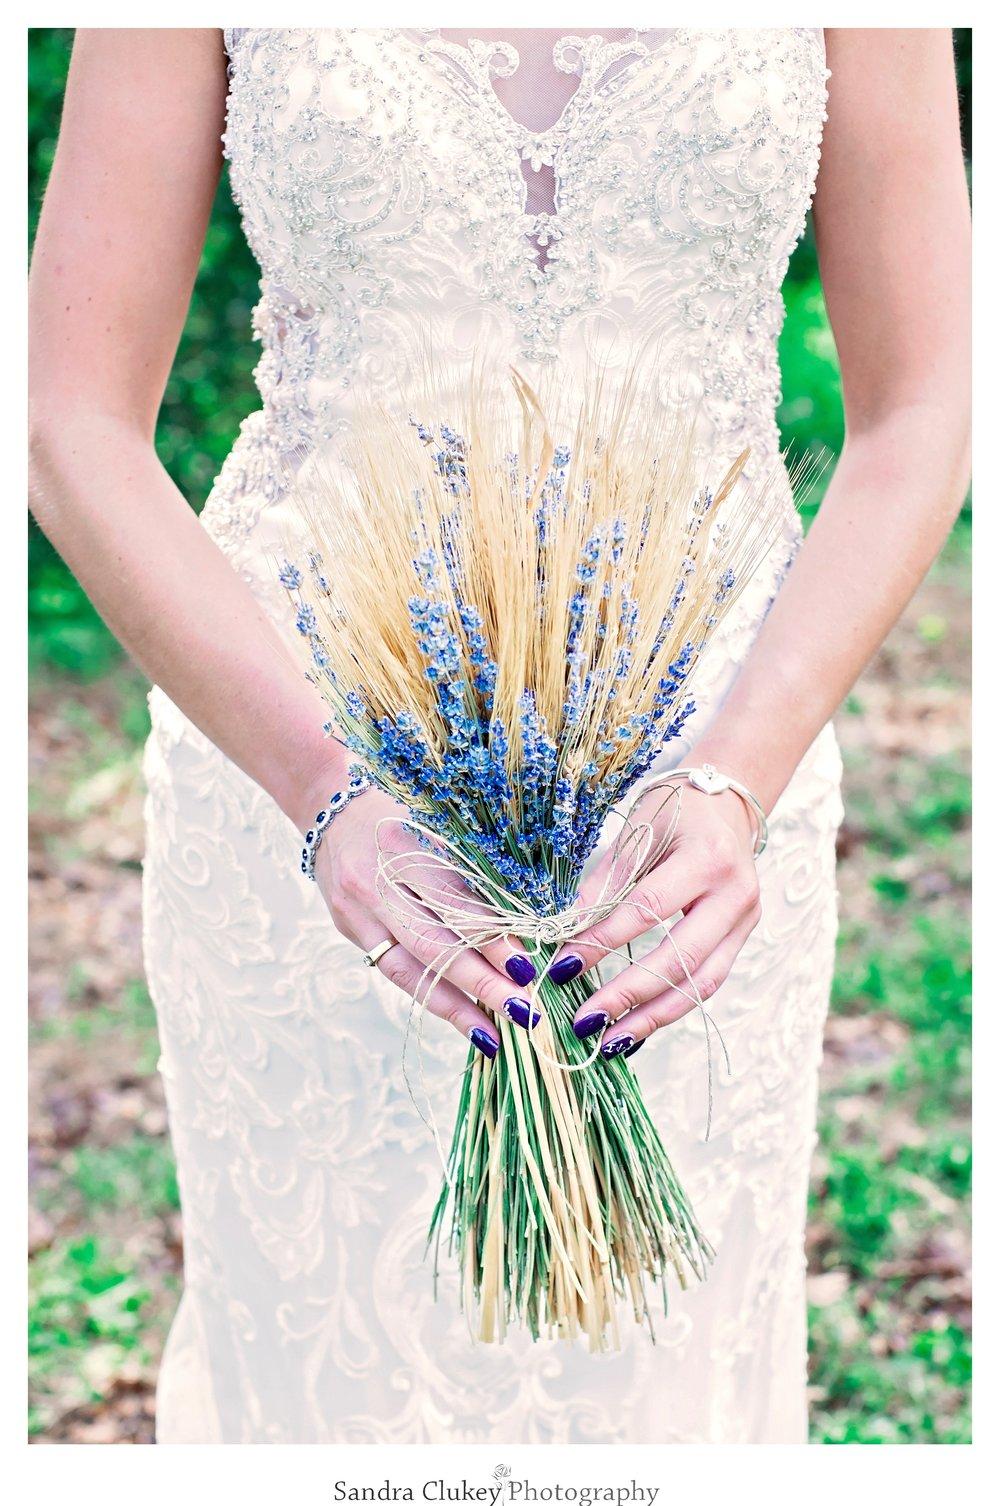 Stunning bridal image